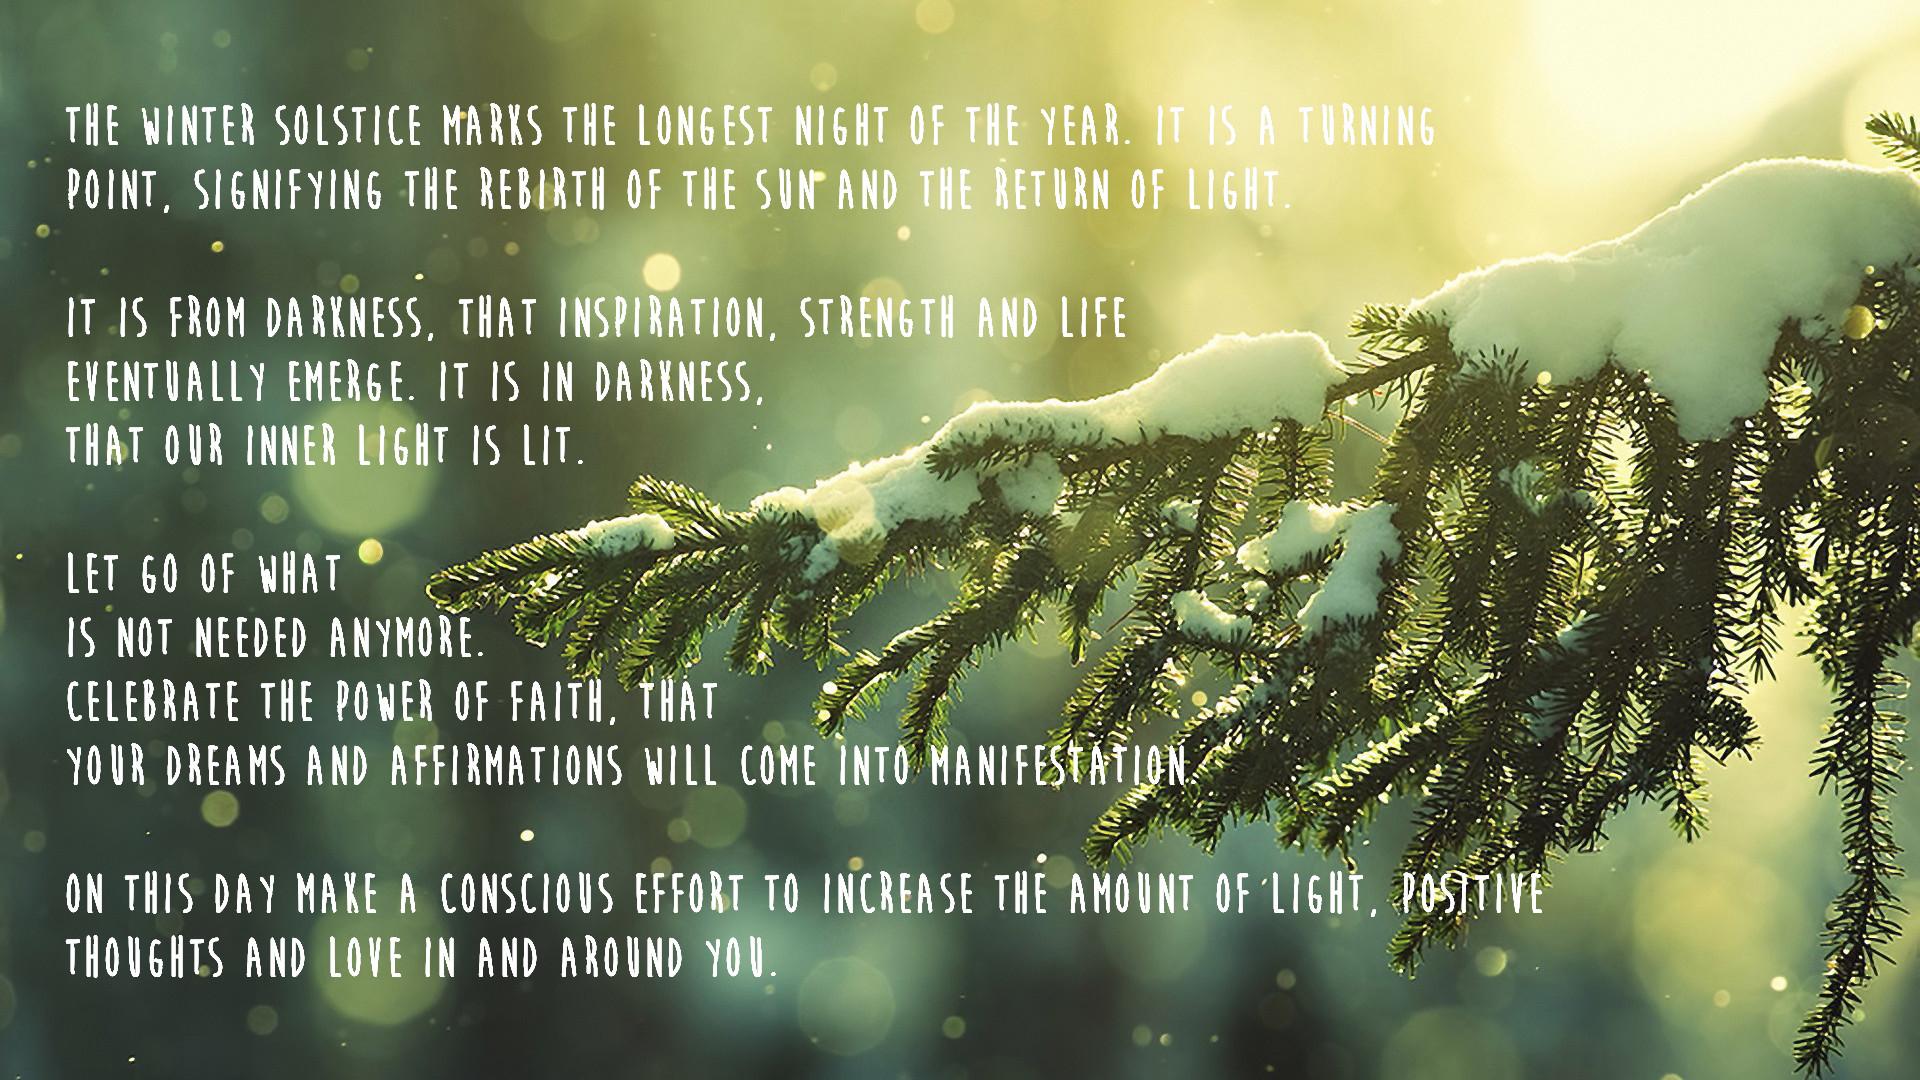 Best 10+ Winter solstice quotes ideas on Pinterest   Galaxy quotes, Winter  solstice rituals and Winter solstice